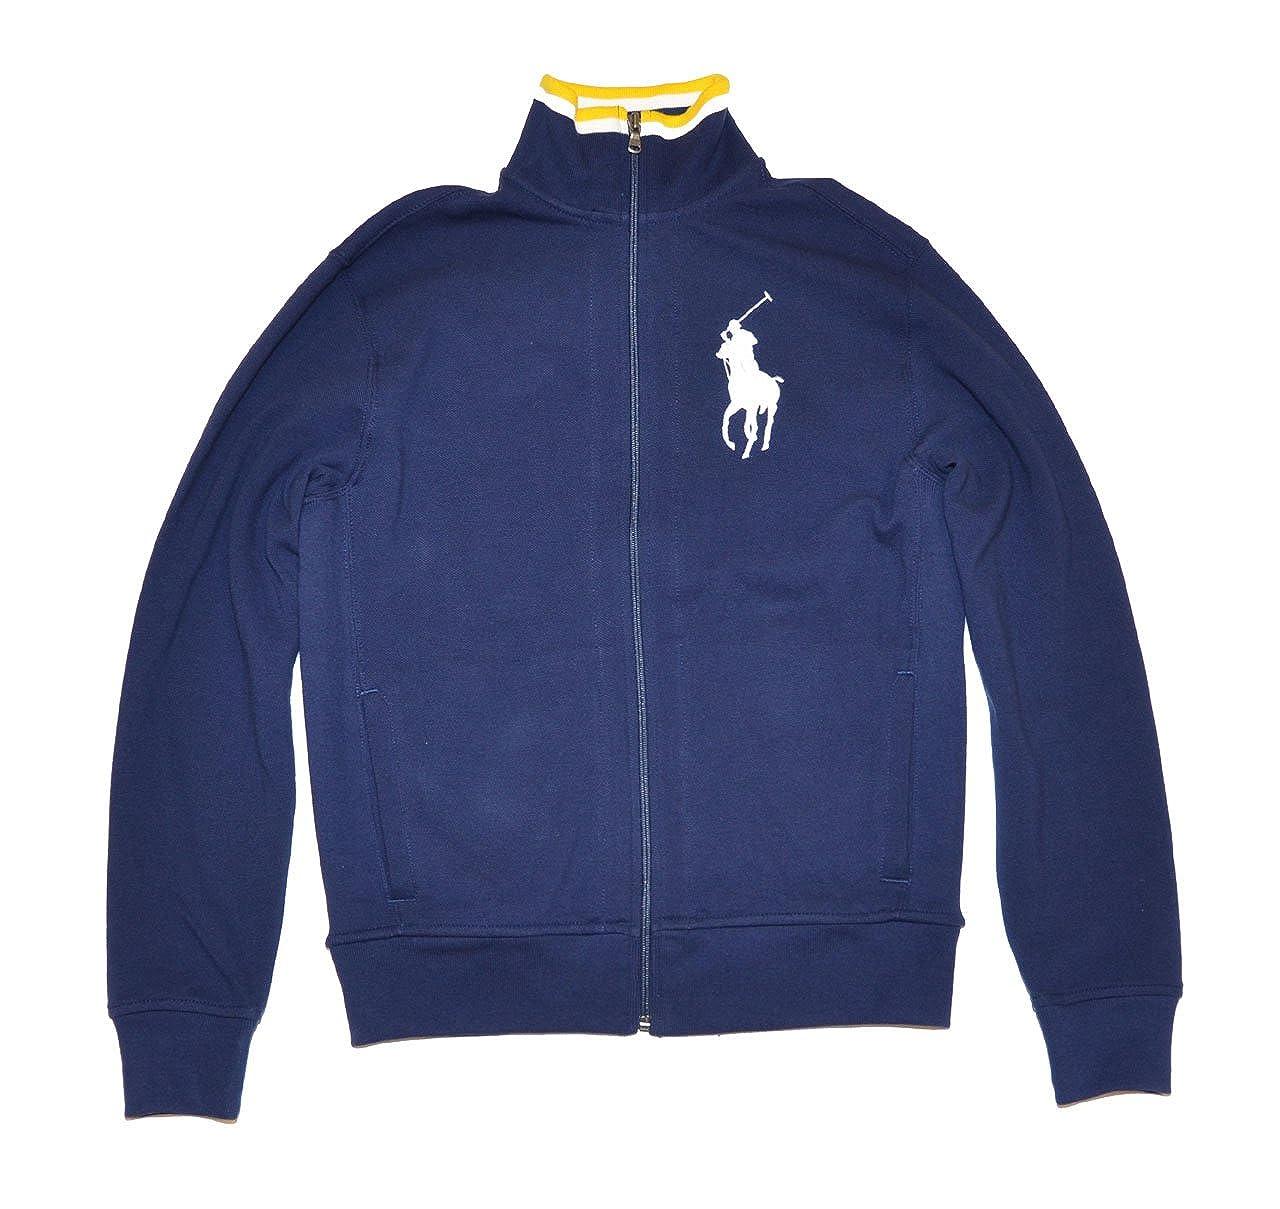 c63b634af99f RALPH LAUREN Polo Men s Big Pony Full Zip Navy Blue Long Sleeve Jacket at  Amazon Men s Clothing store